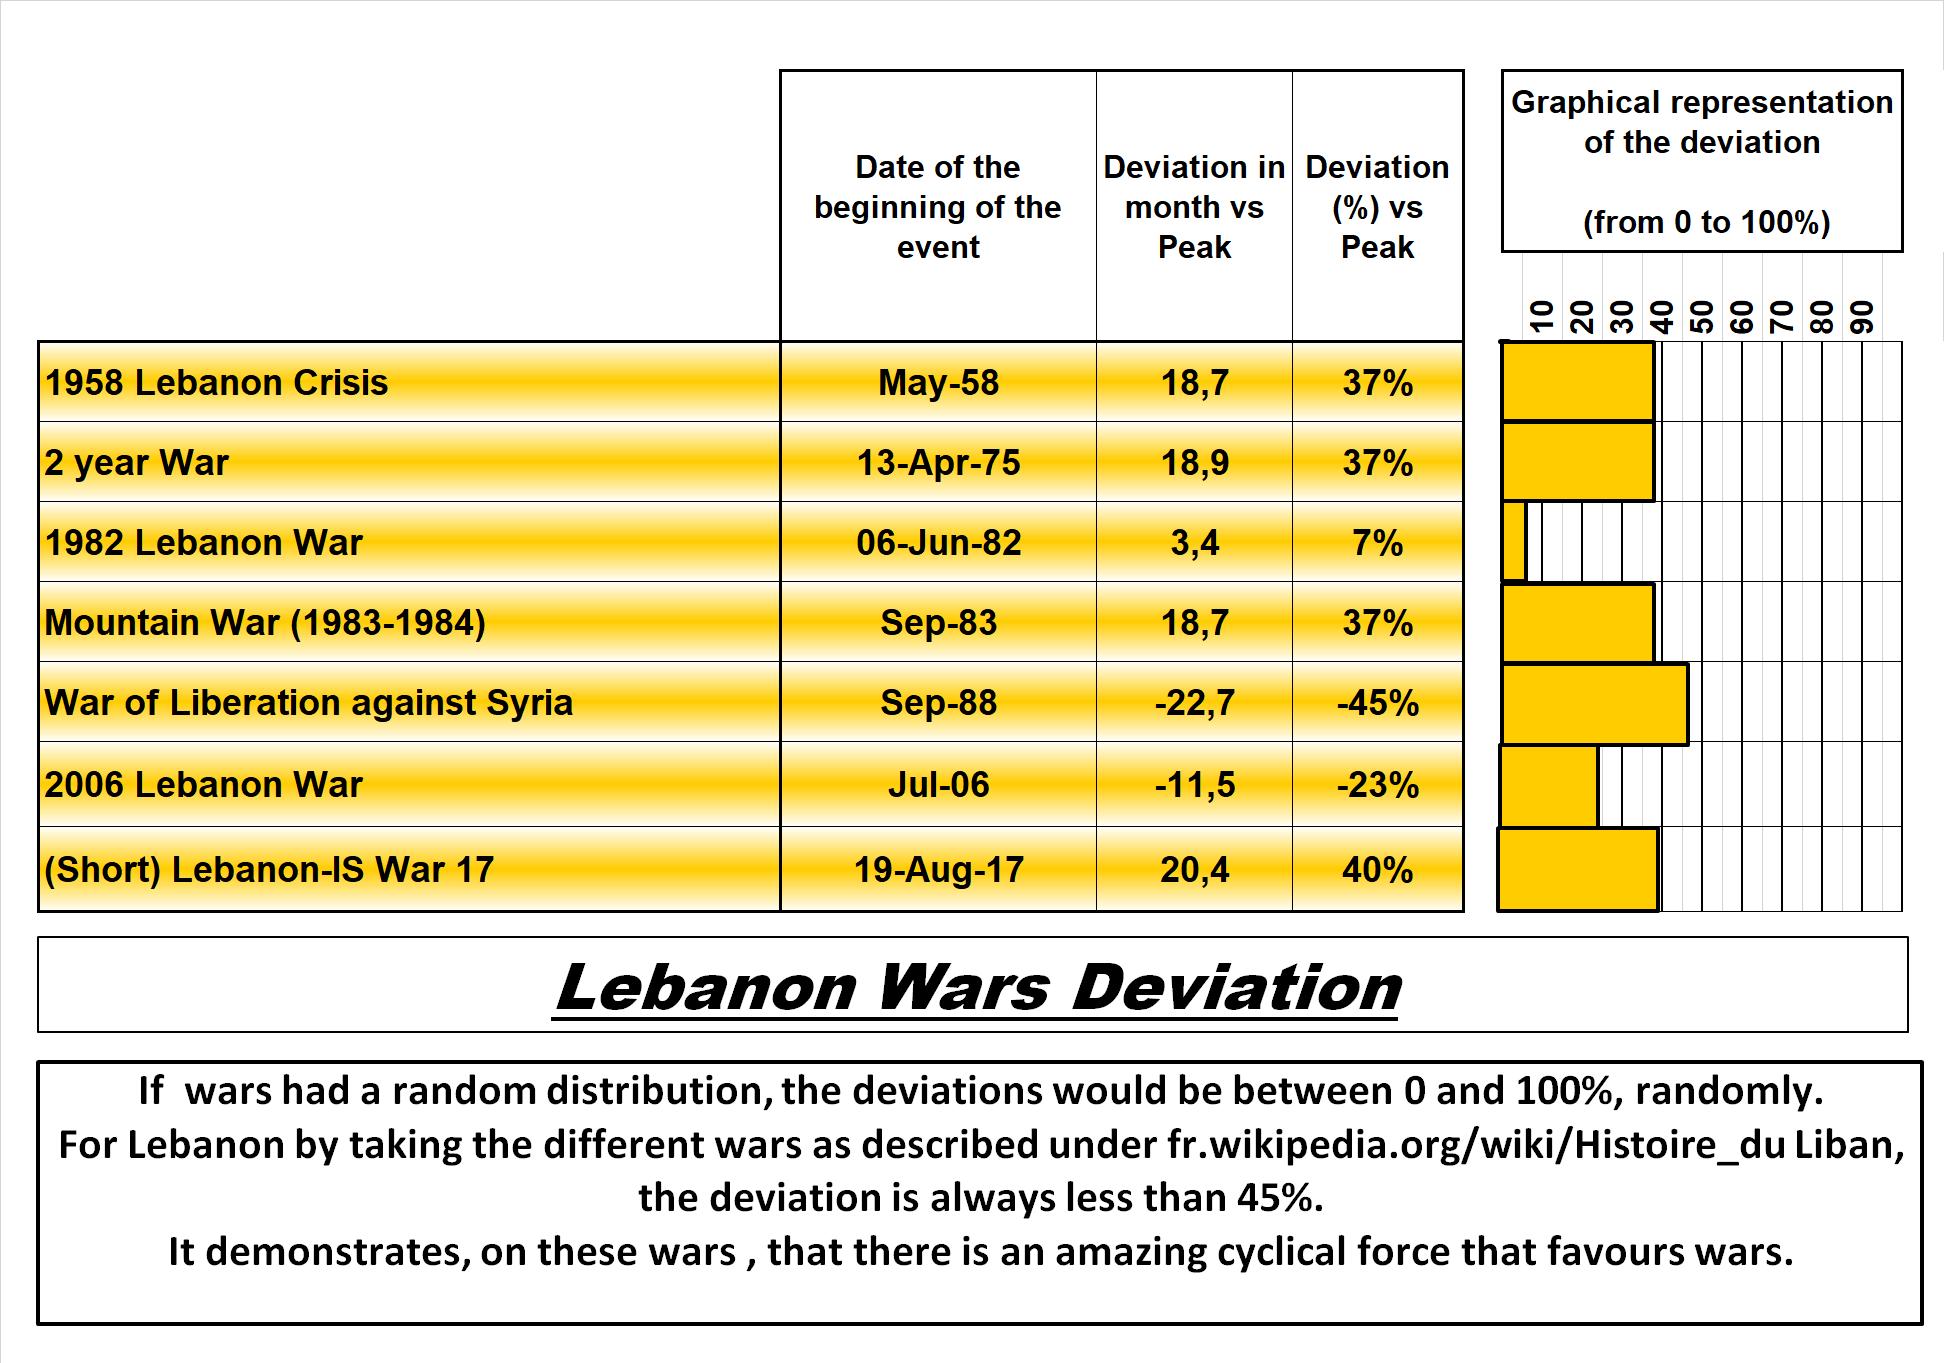 Lebanon Wars Deviation